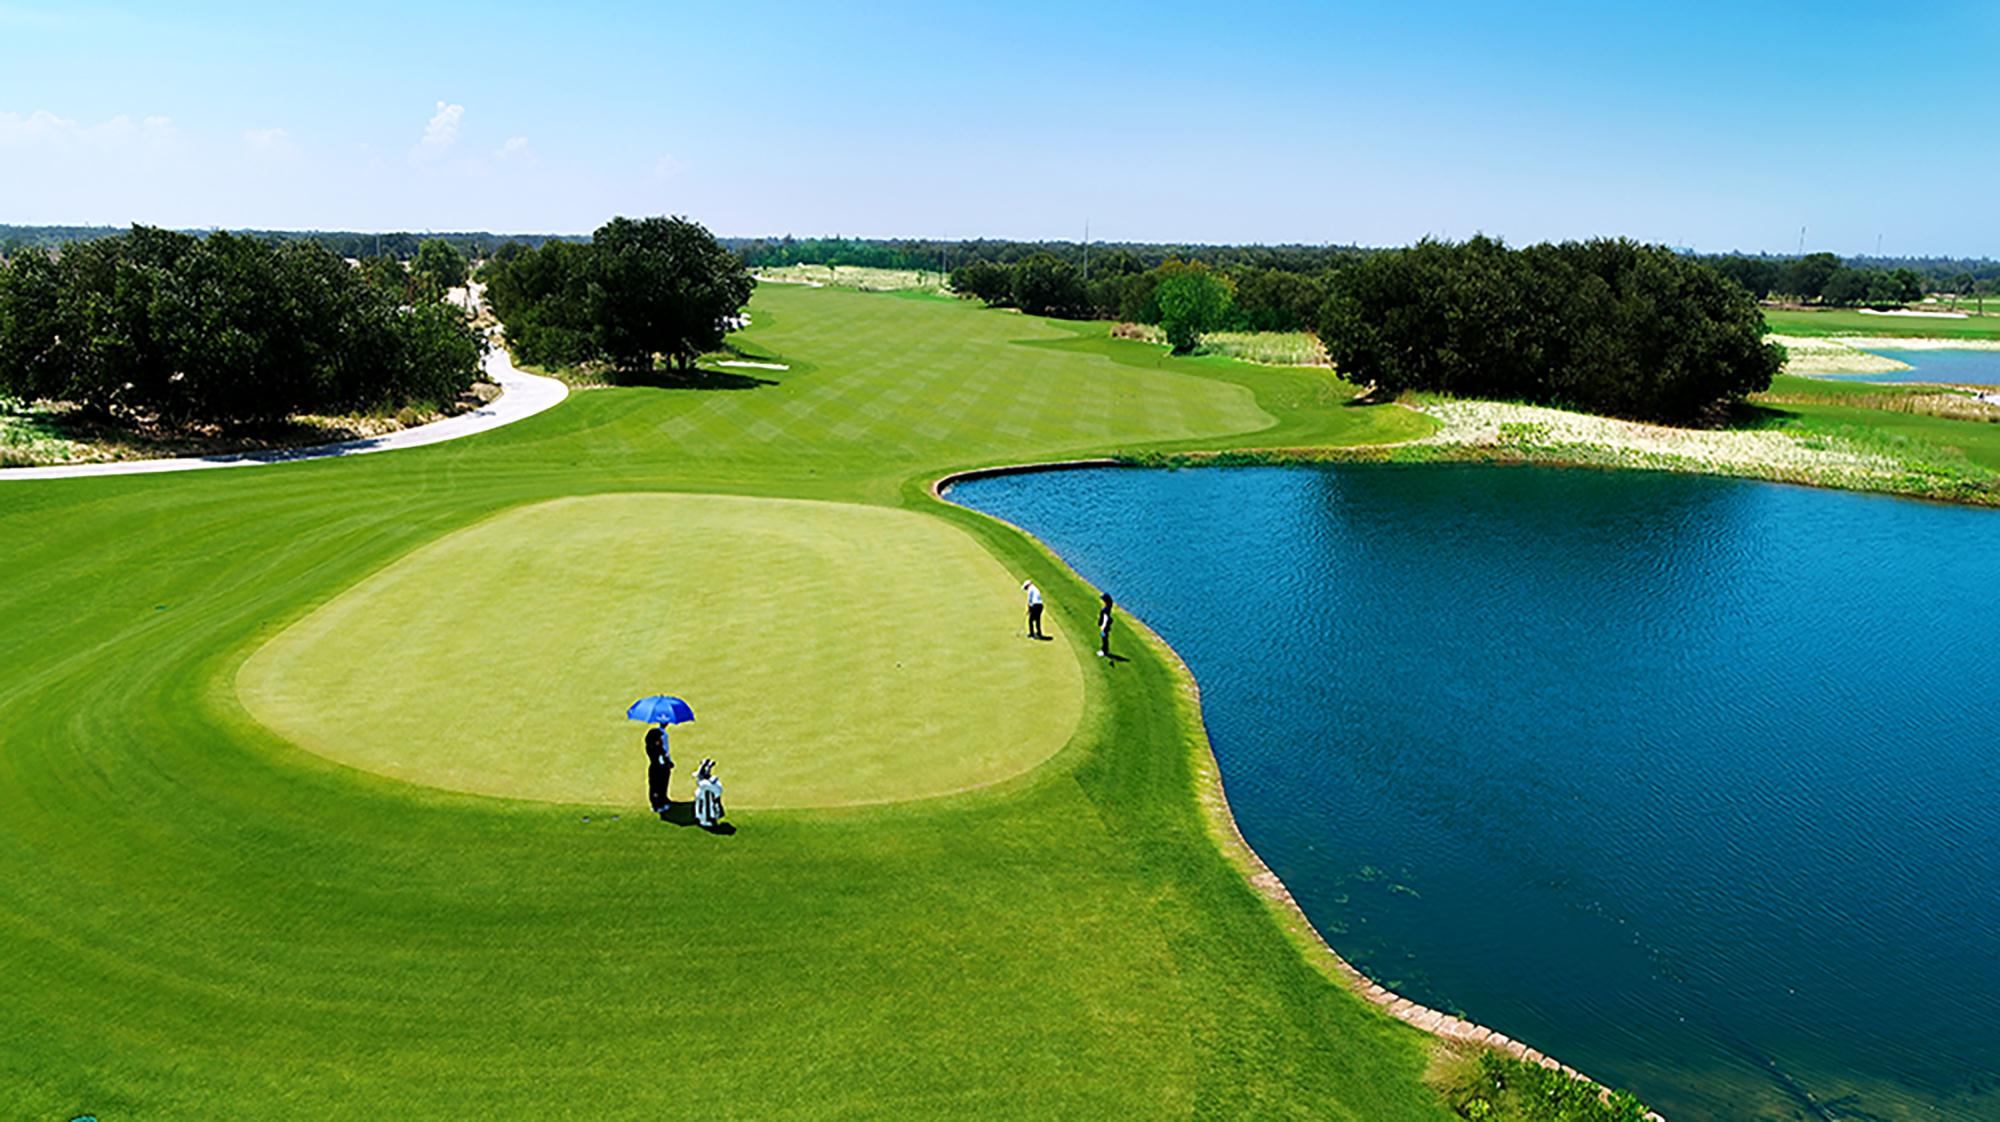 Vinpearl Golf Nam Hoi An